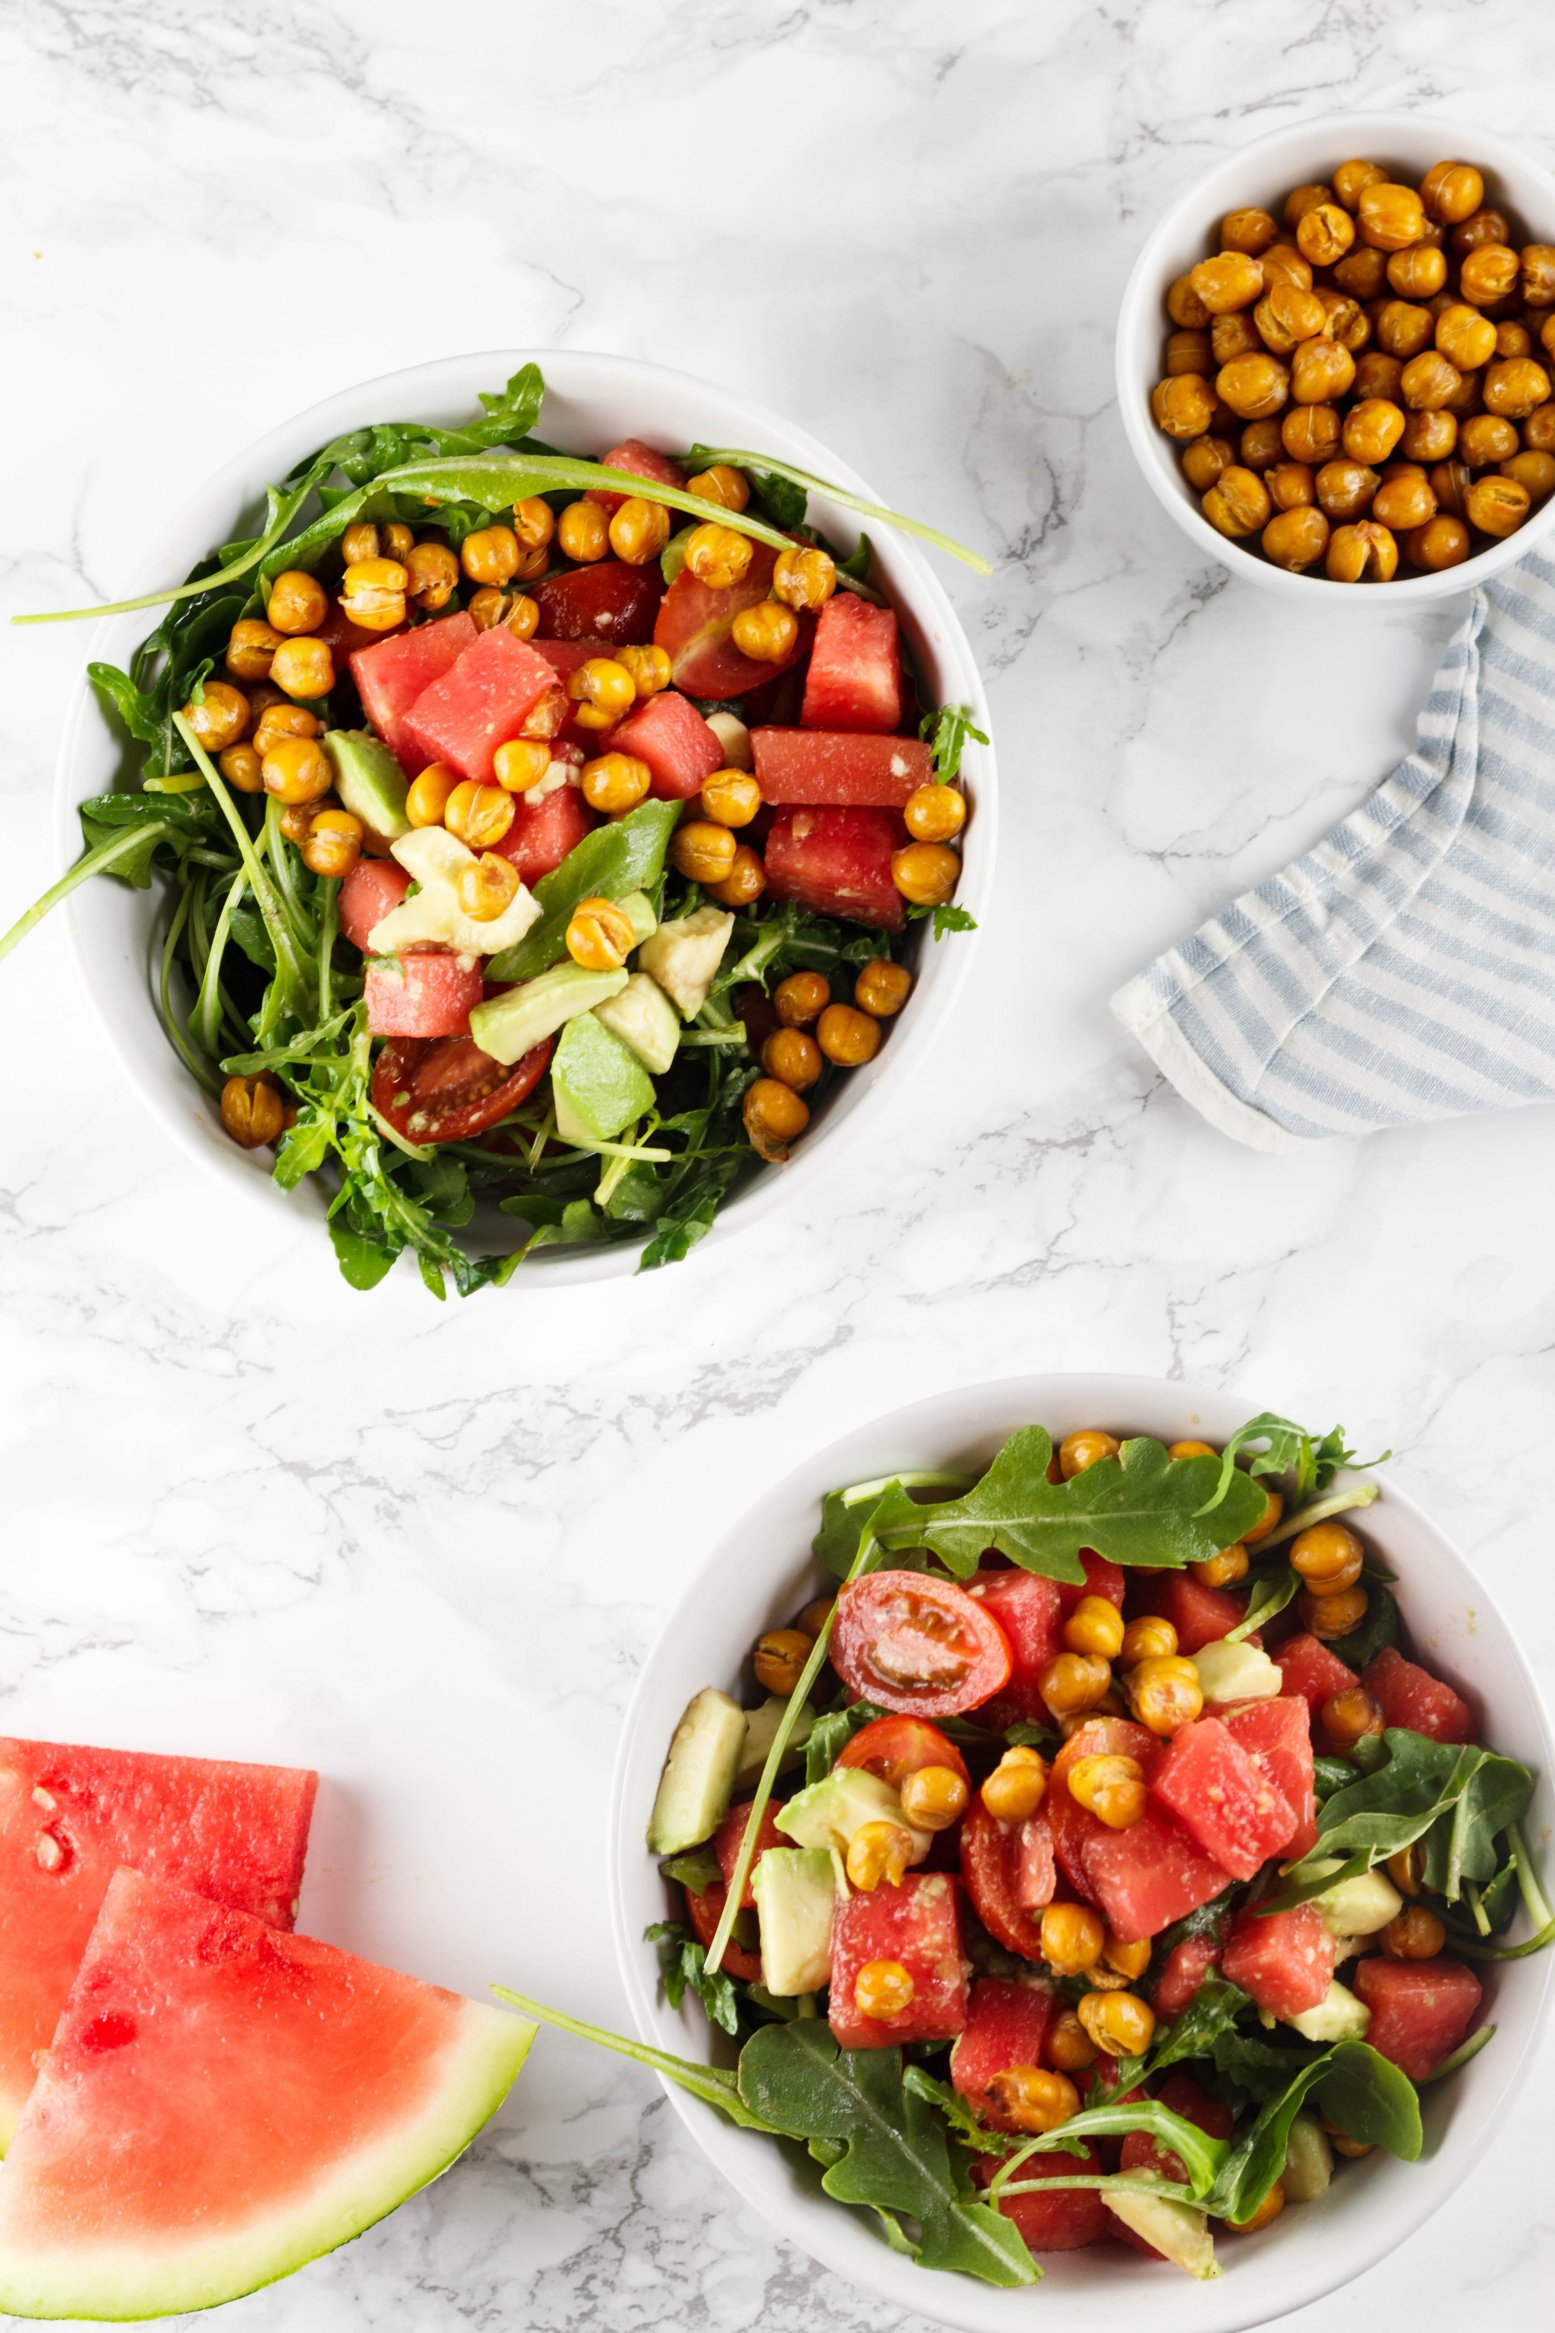 Wassermelonensalat vegan mit Kichererbsen